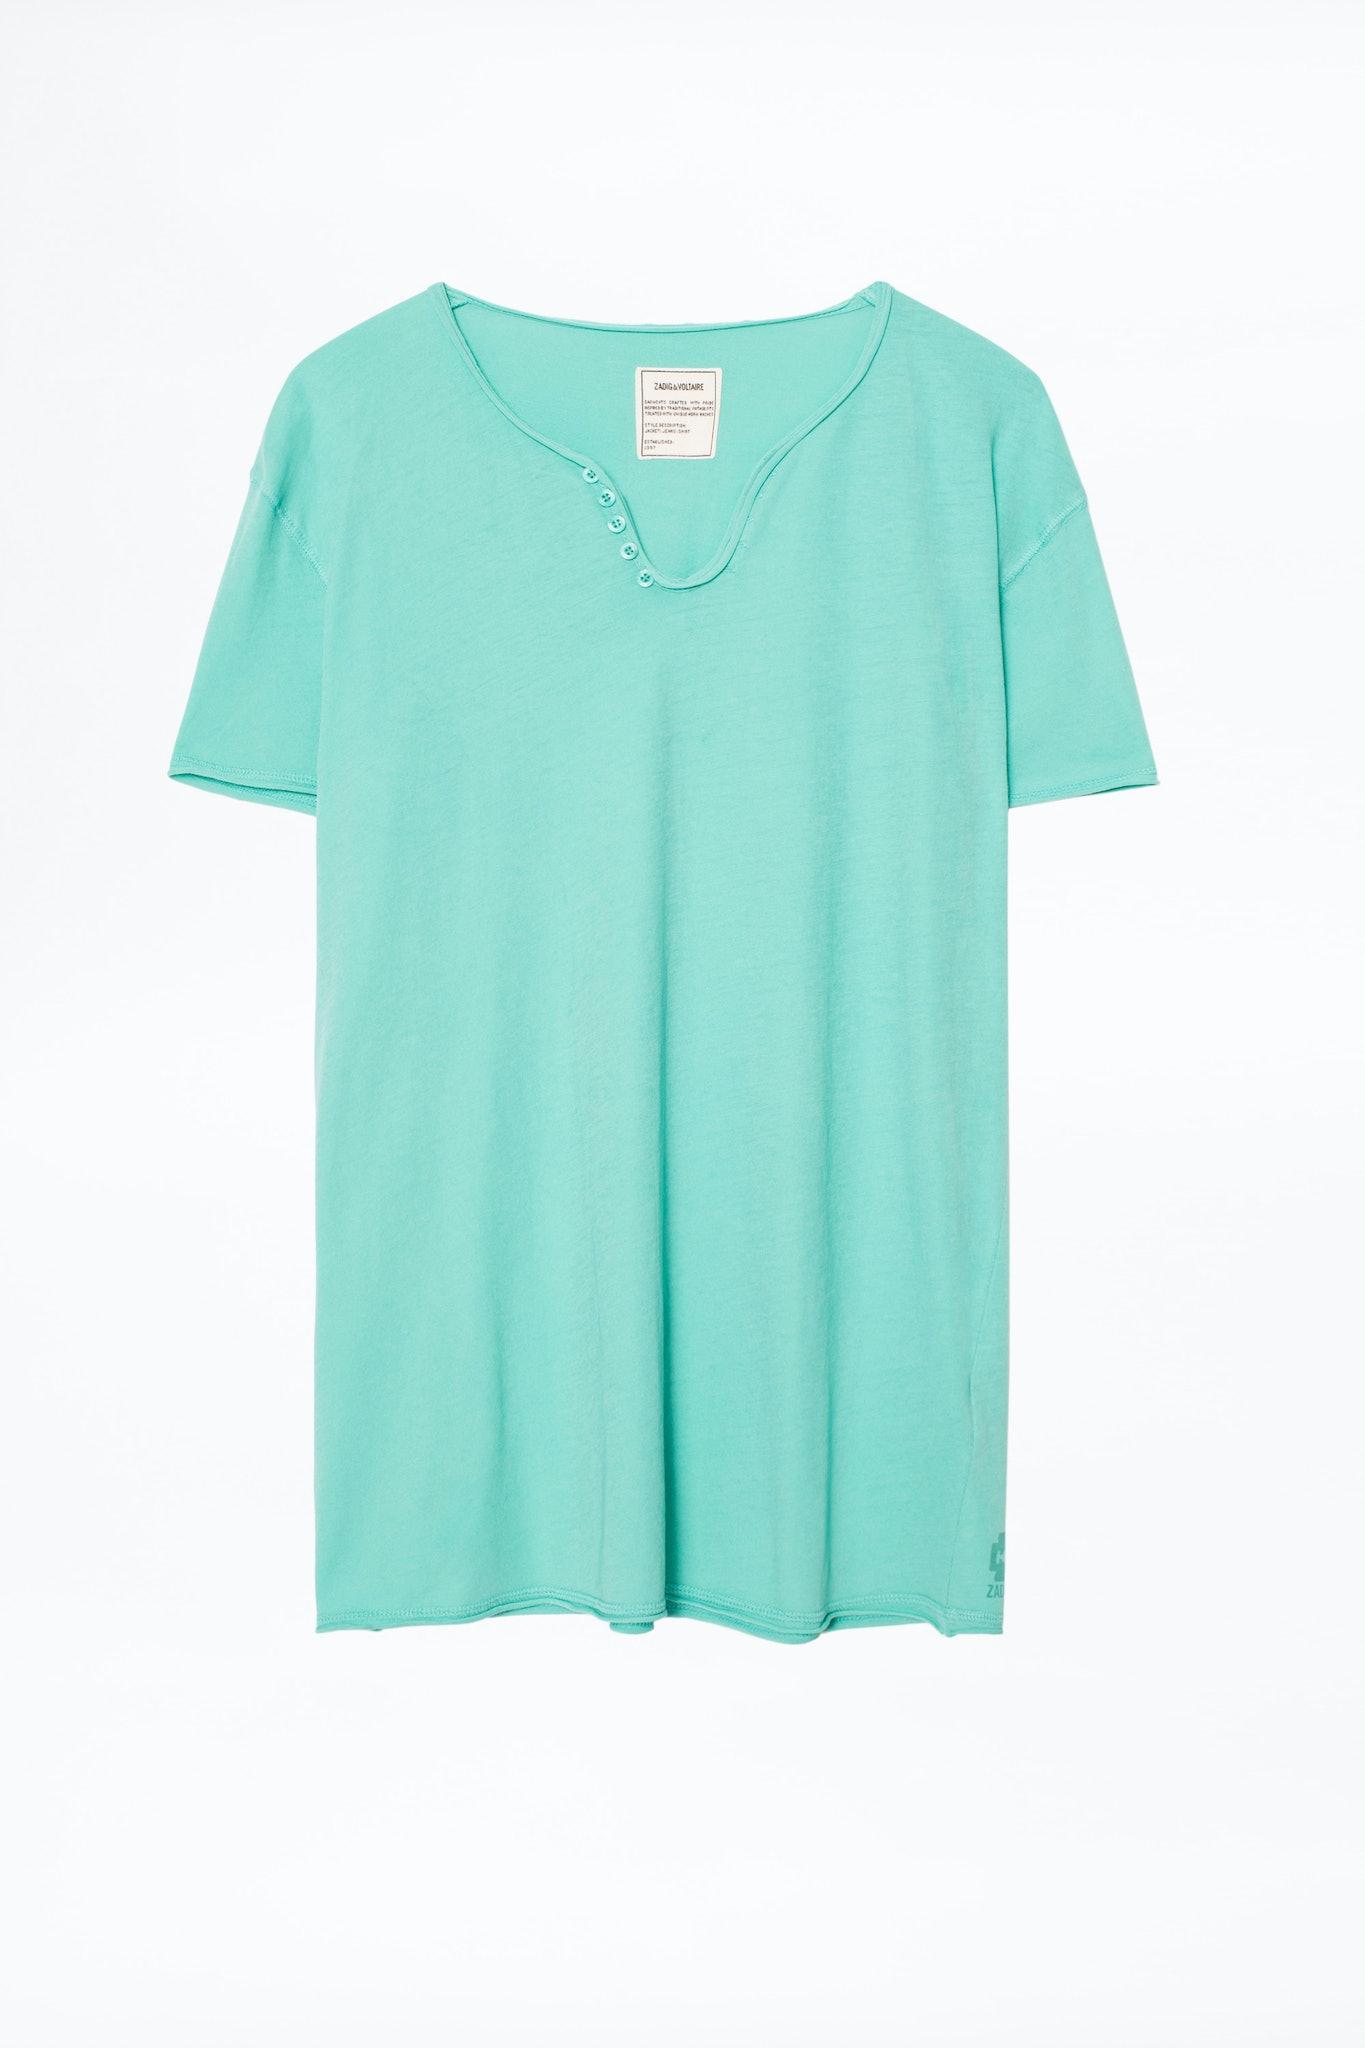 Camiseta Cuello Panadero Monastir Vintage